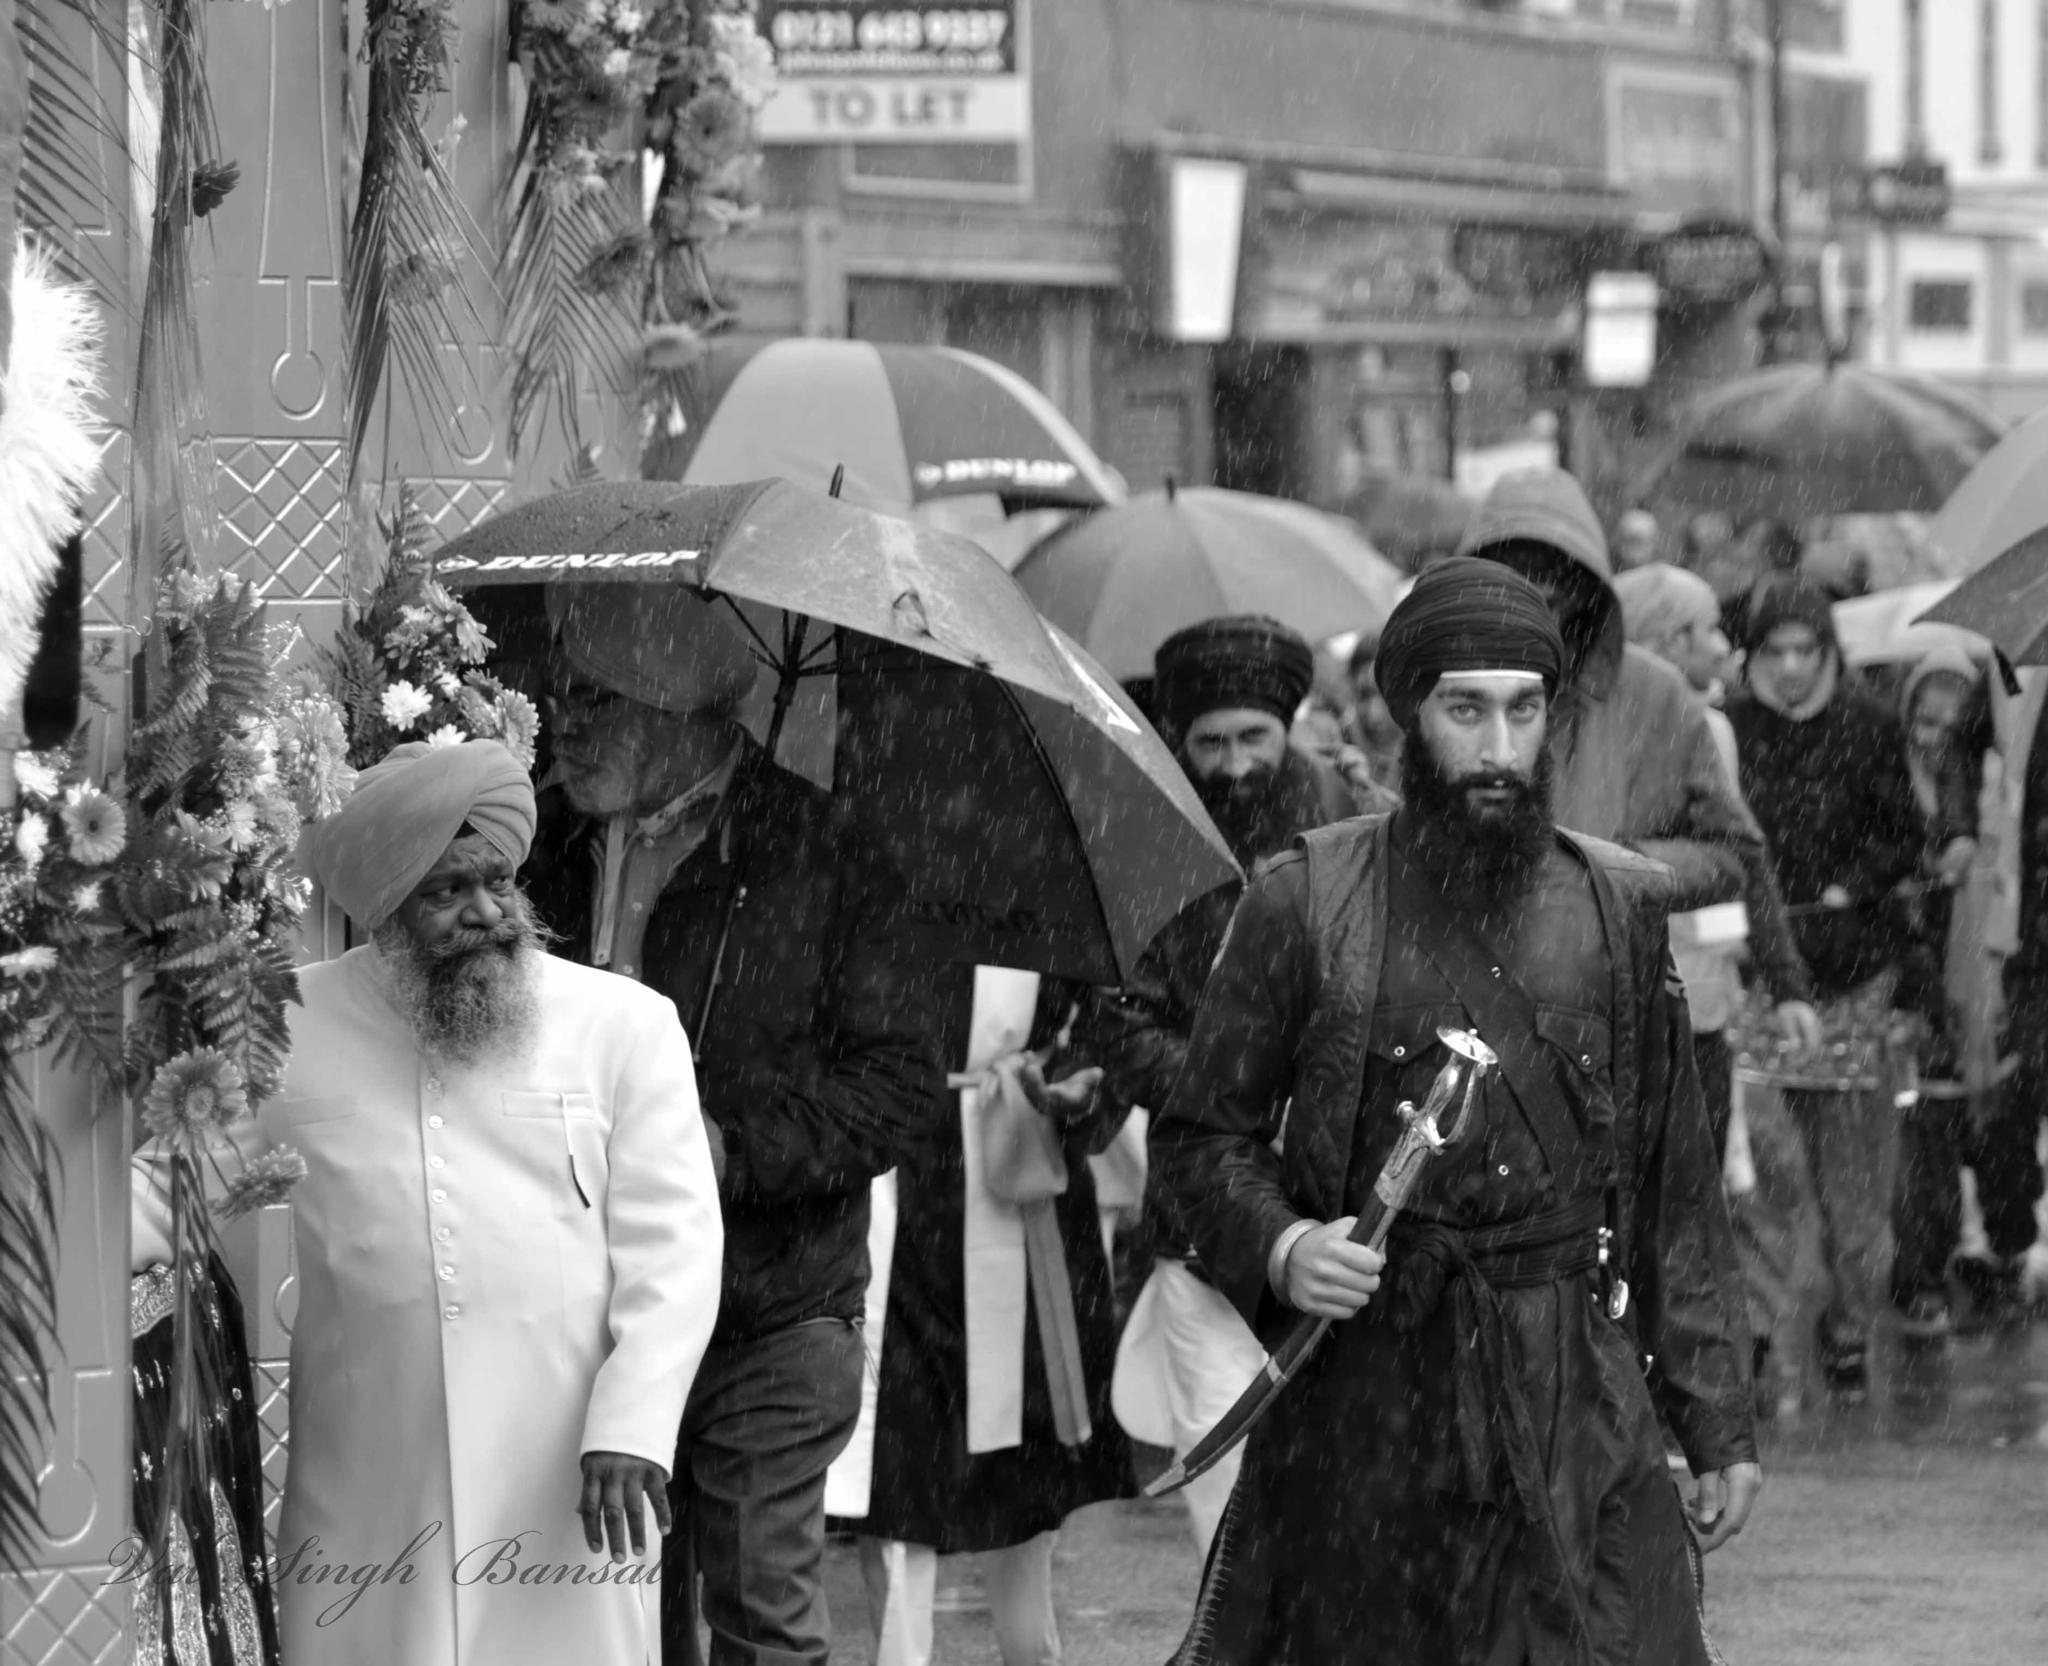 Singhing in the rain by valjinder.bansal